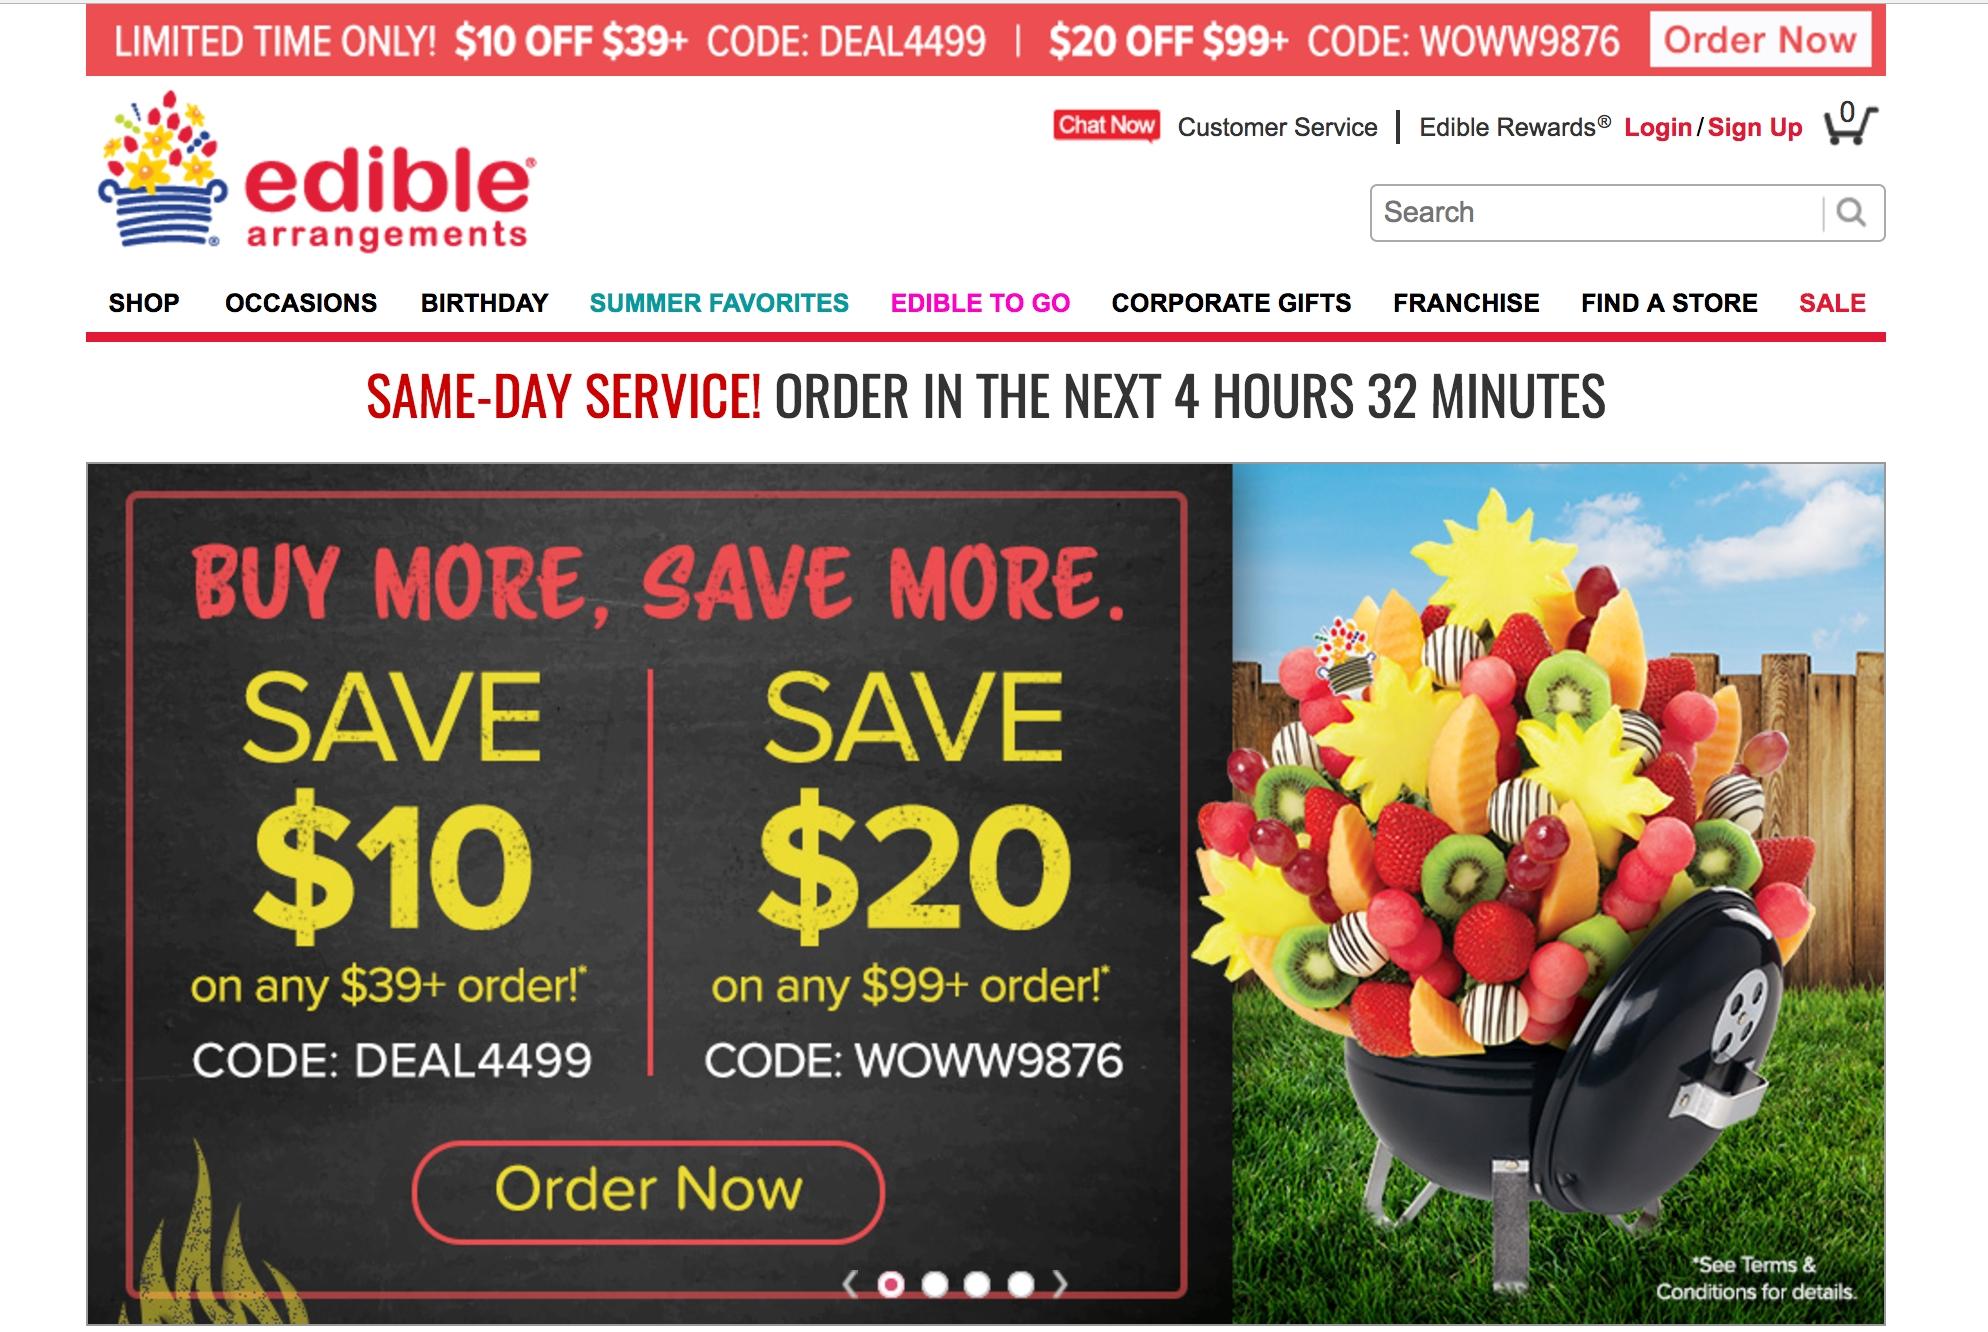 Edible arrangements coupon code 20 off